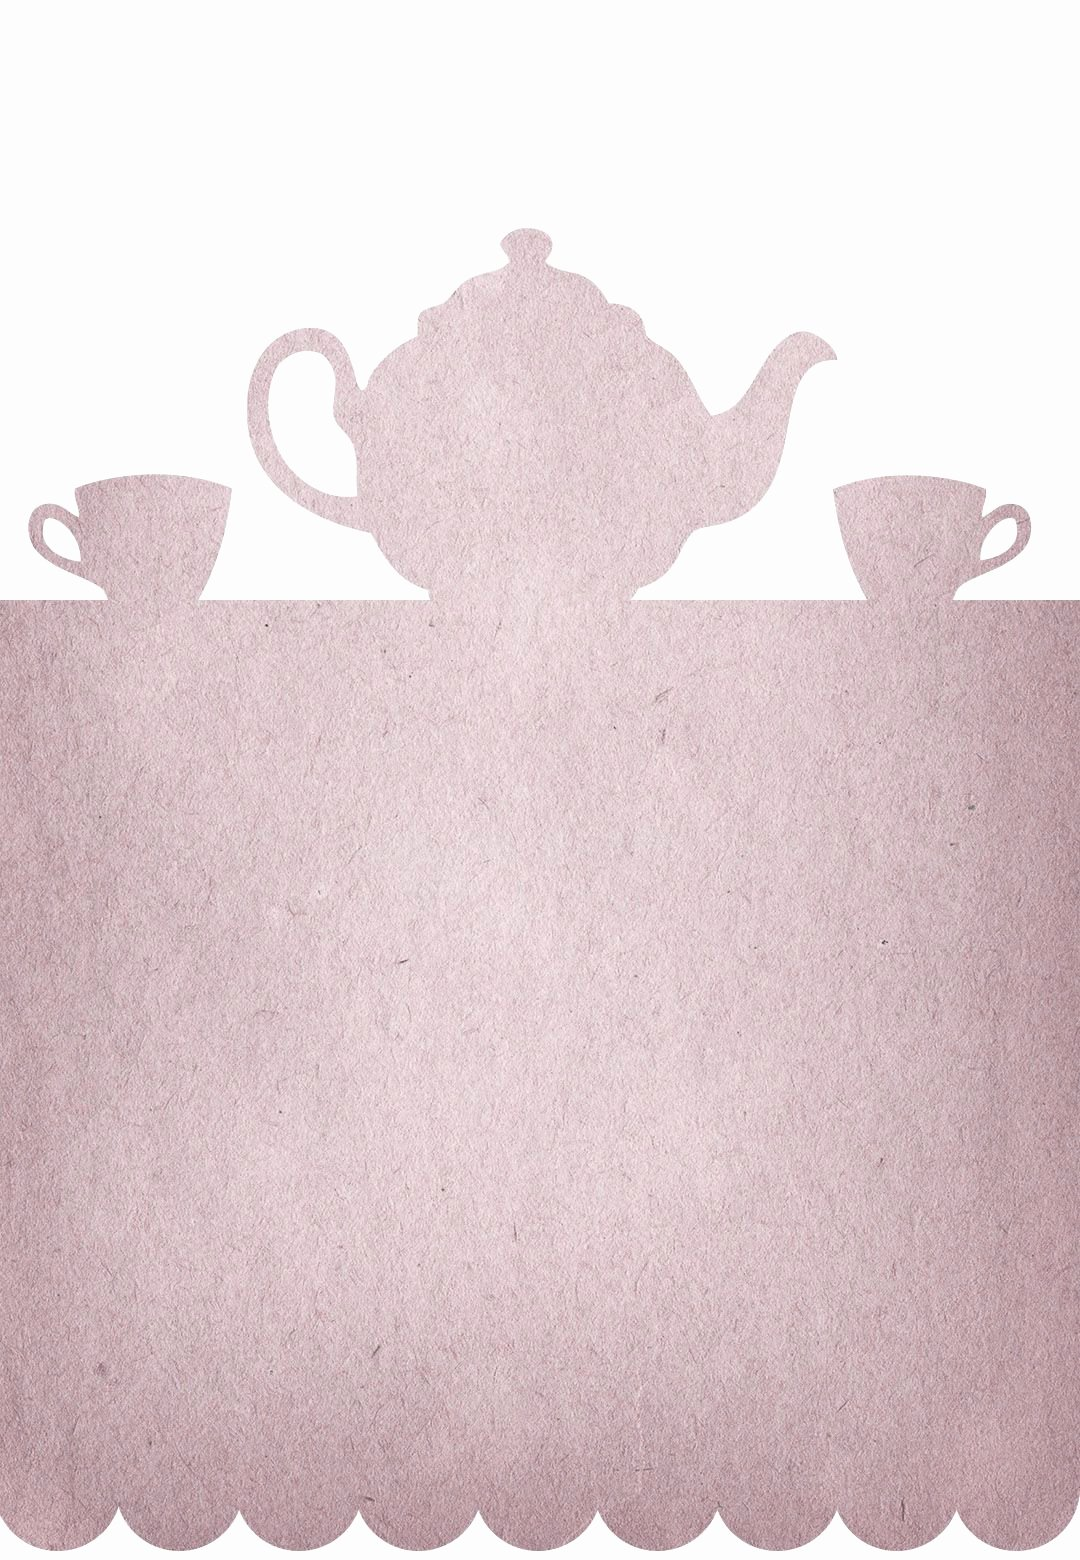 Tea Party Menu Template Fresh Tea Party Free Printable Party Invitation Template